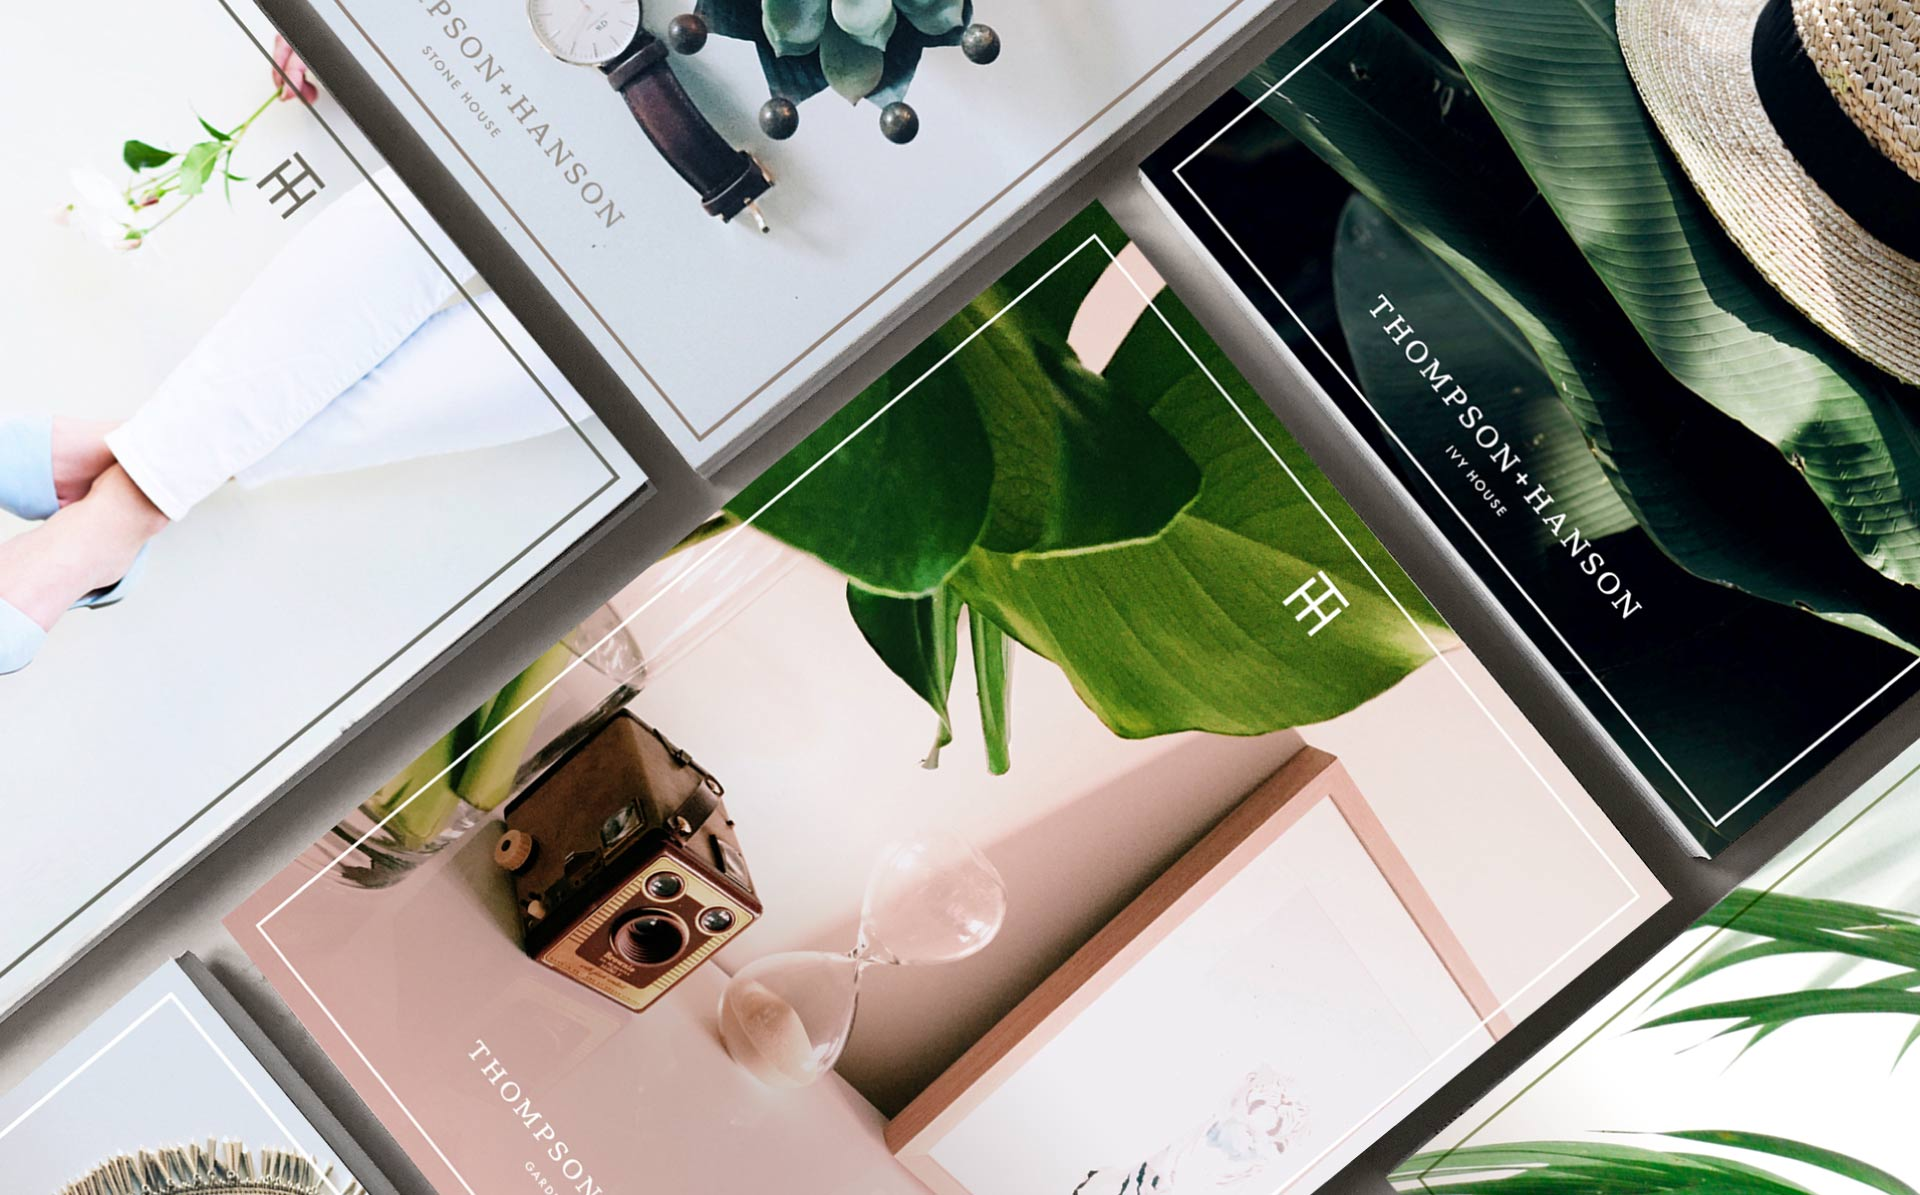 Creative_Retail_Packaging_Thompson_Hanson_Branding_16.jpg